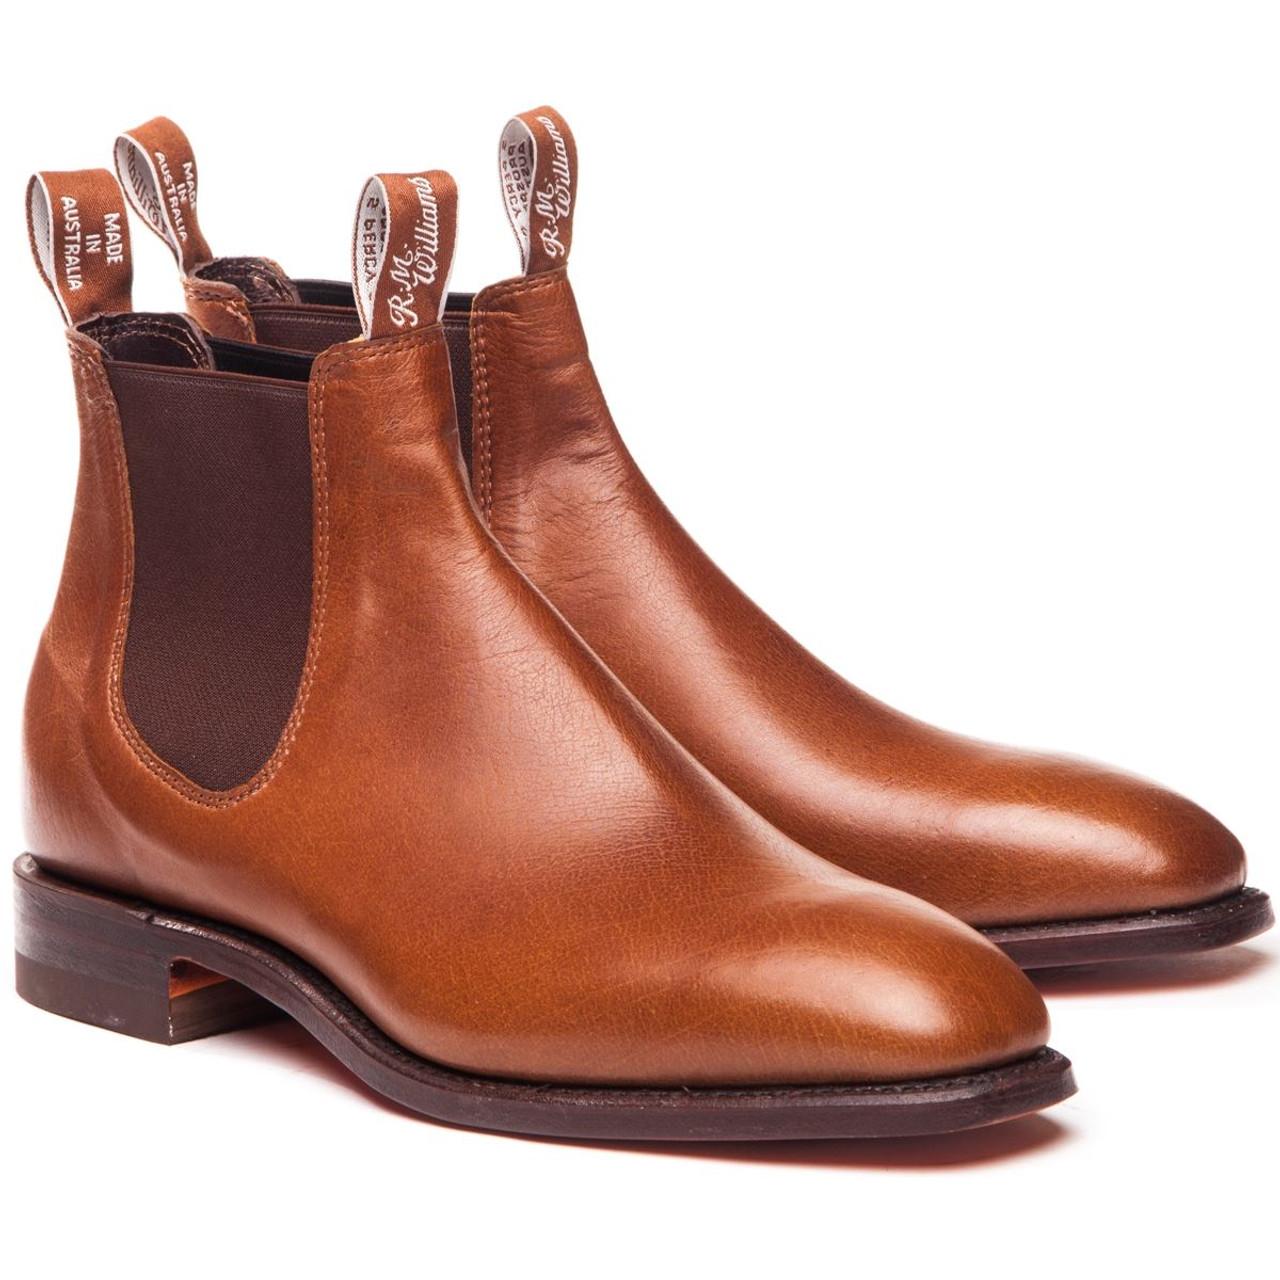 R.M. Williams Kangaroo Comfort Craftsman Boots